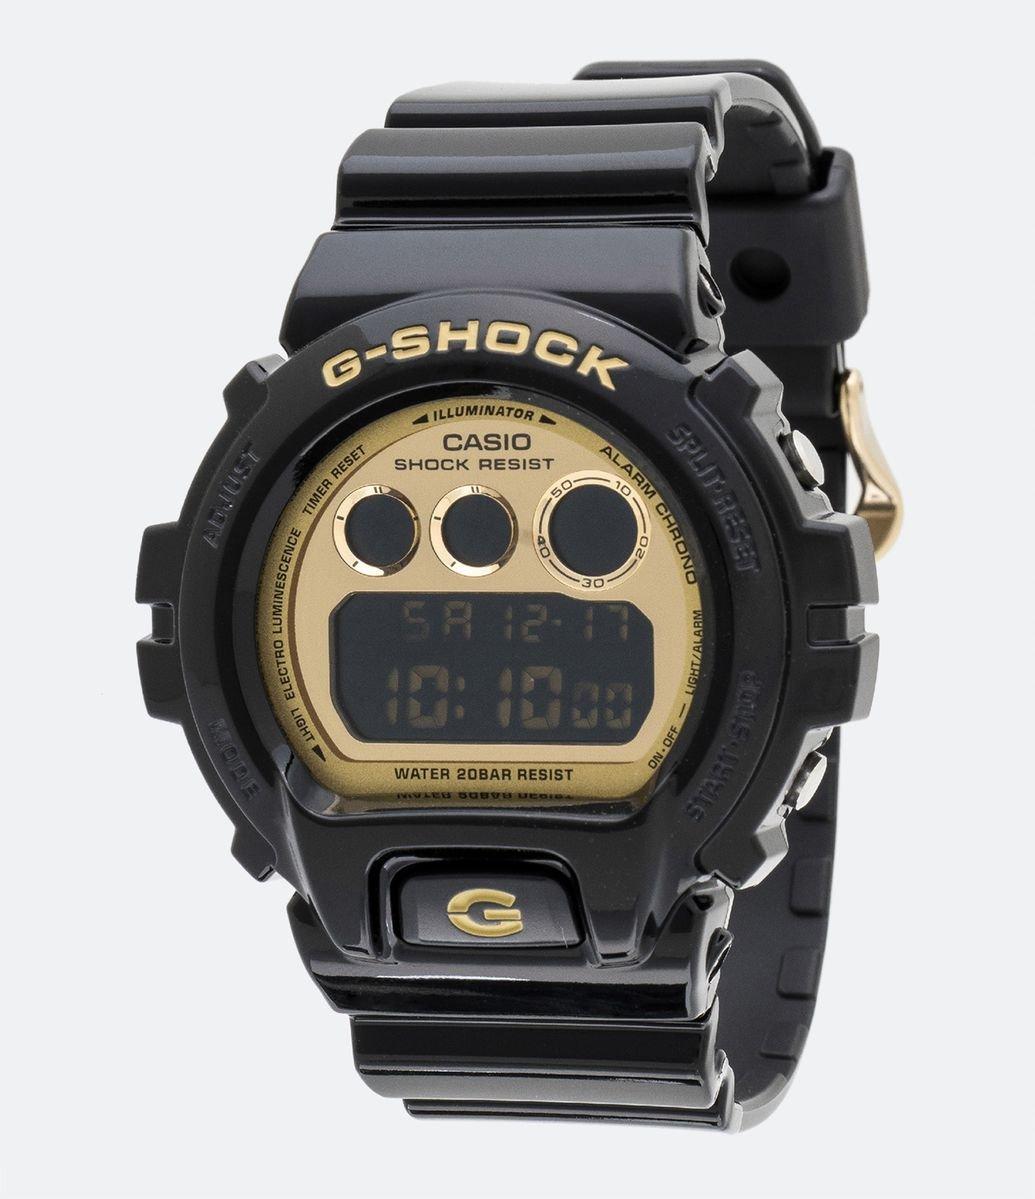 a47a2859856 Relógio Masculino G-Shock Casio DW 6900CB 1DS Digital - Renner